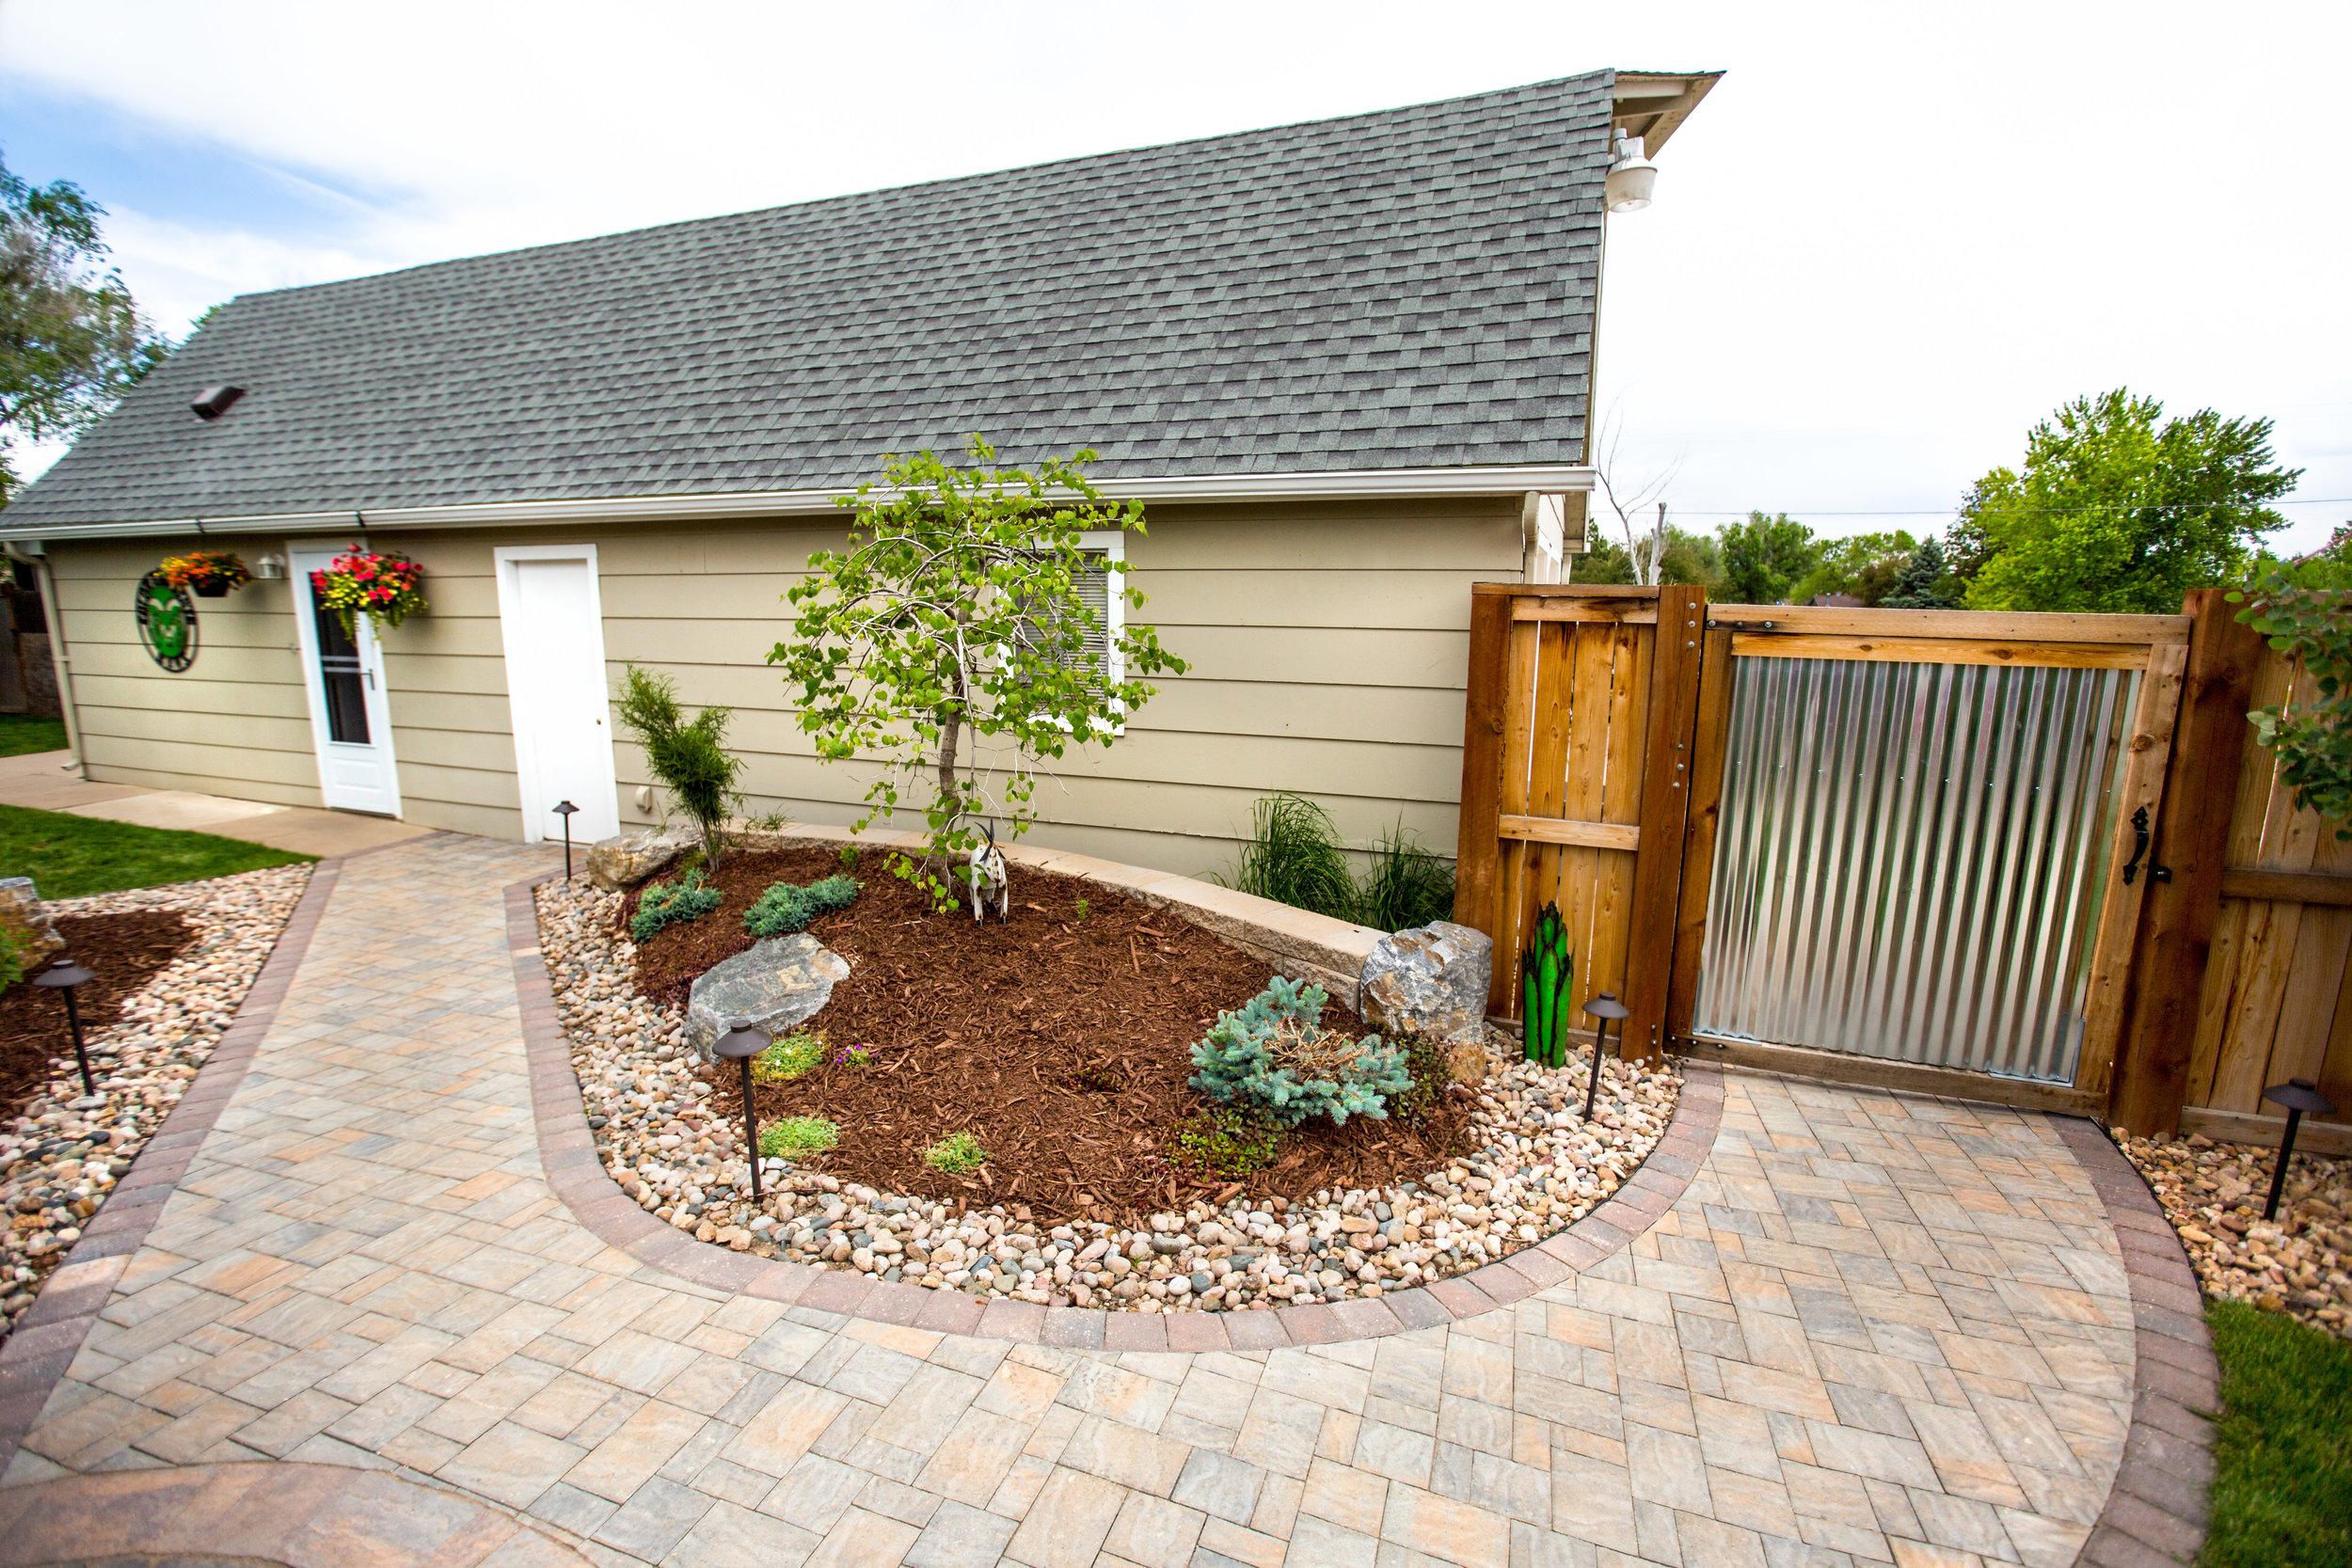 Zak George Landscaping - Residential Landscape Design & Install-11.jpg